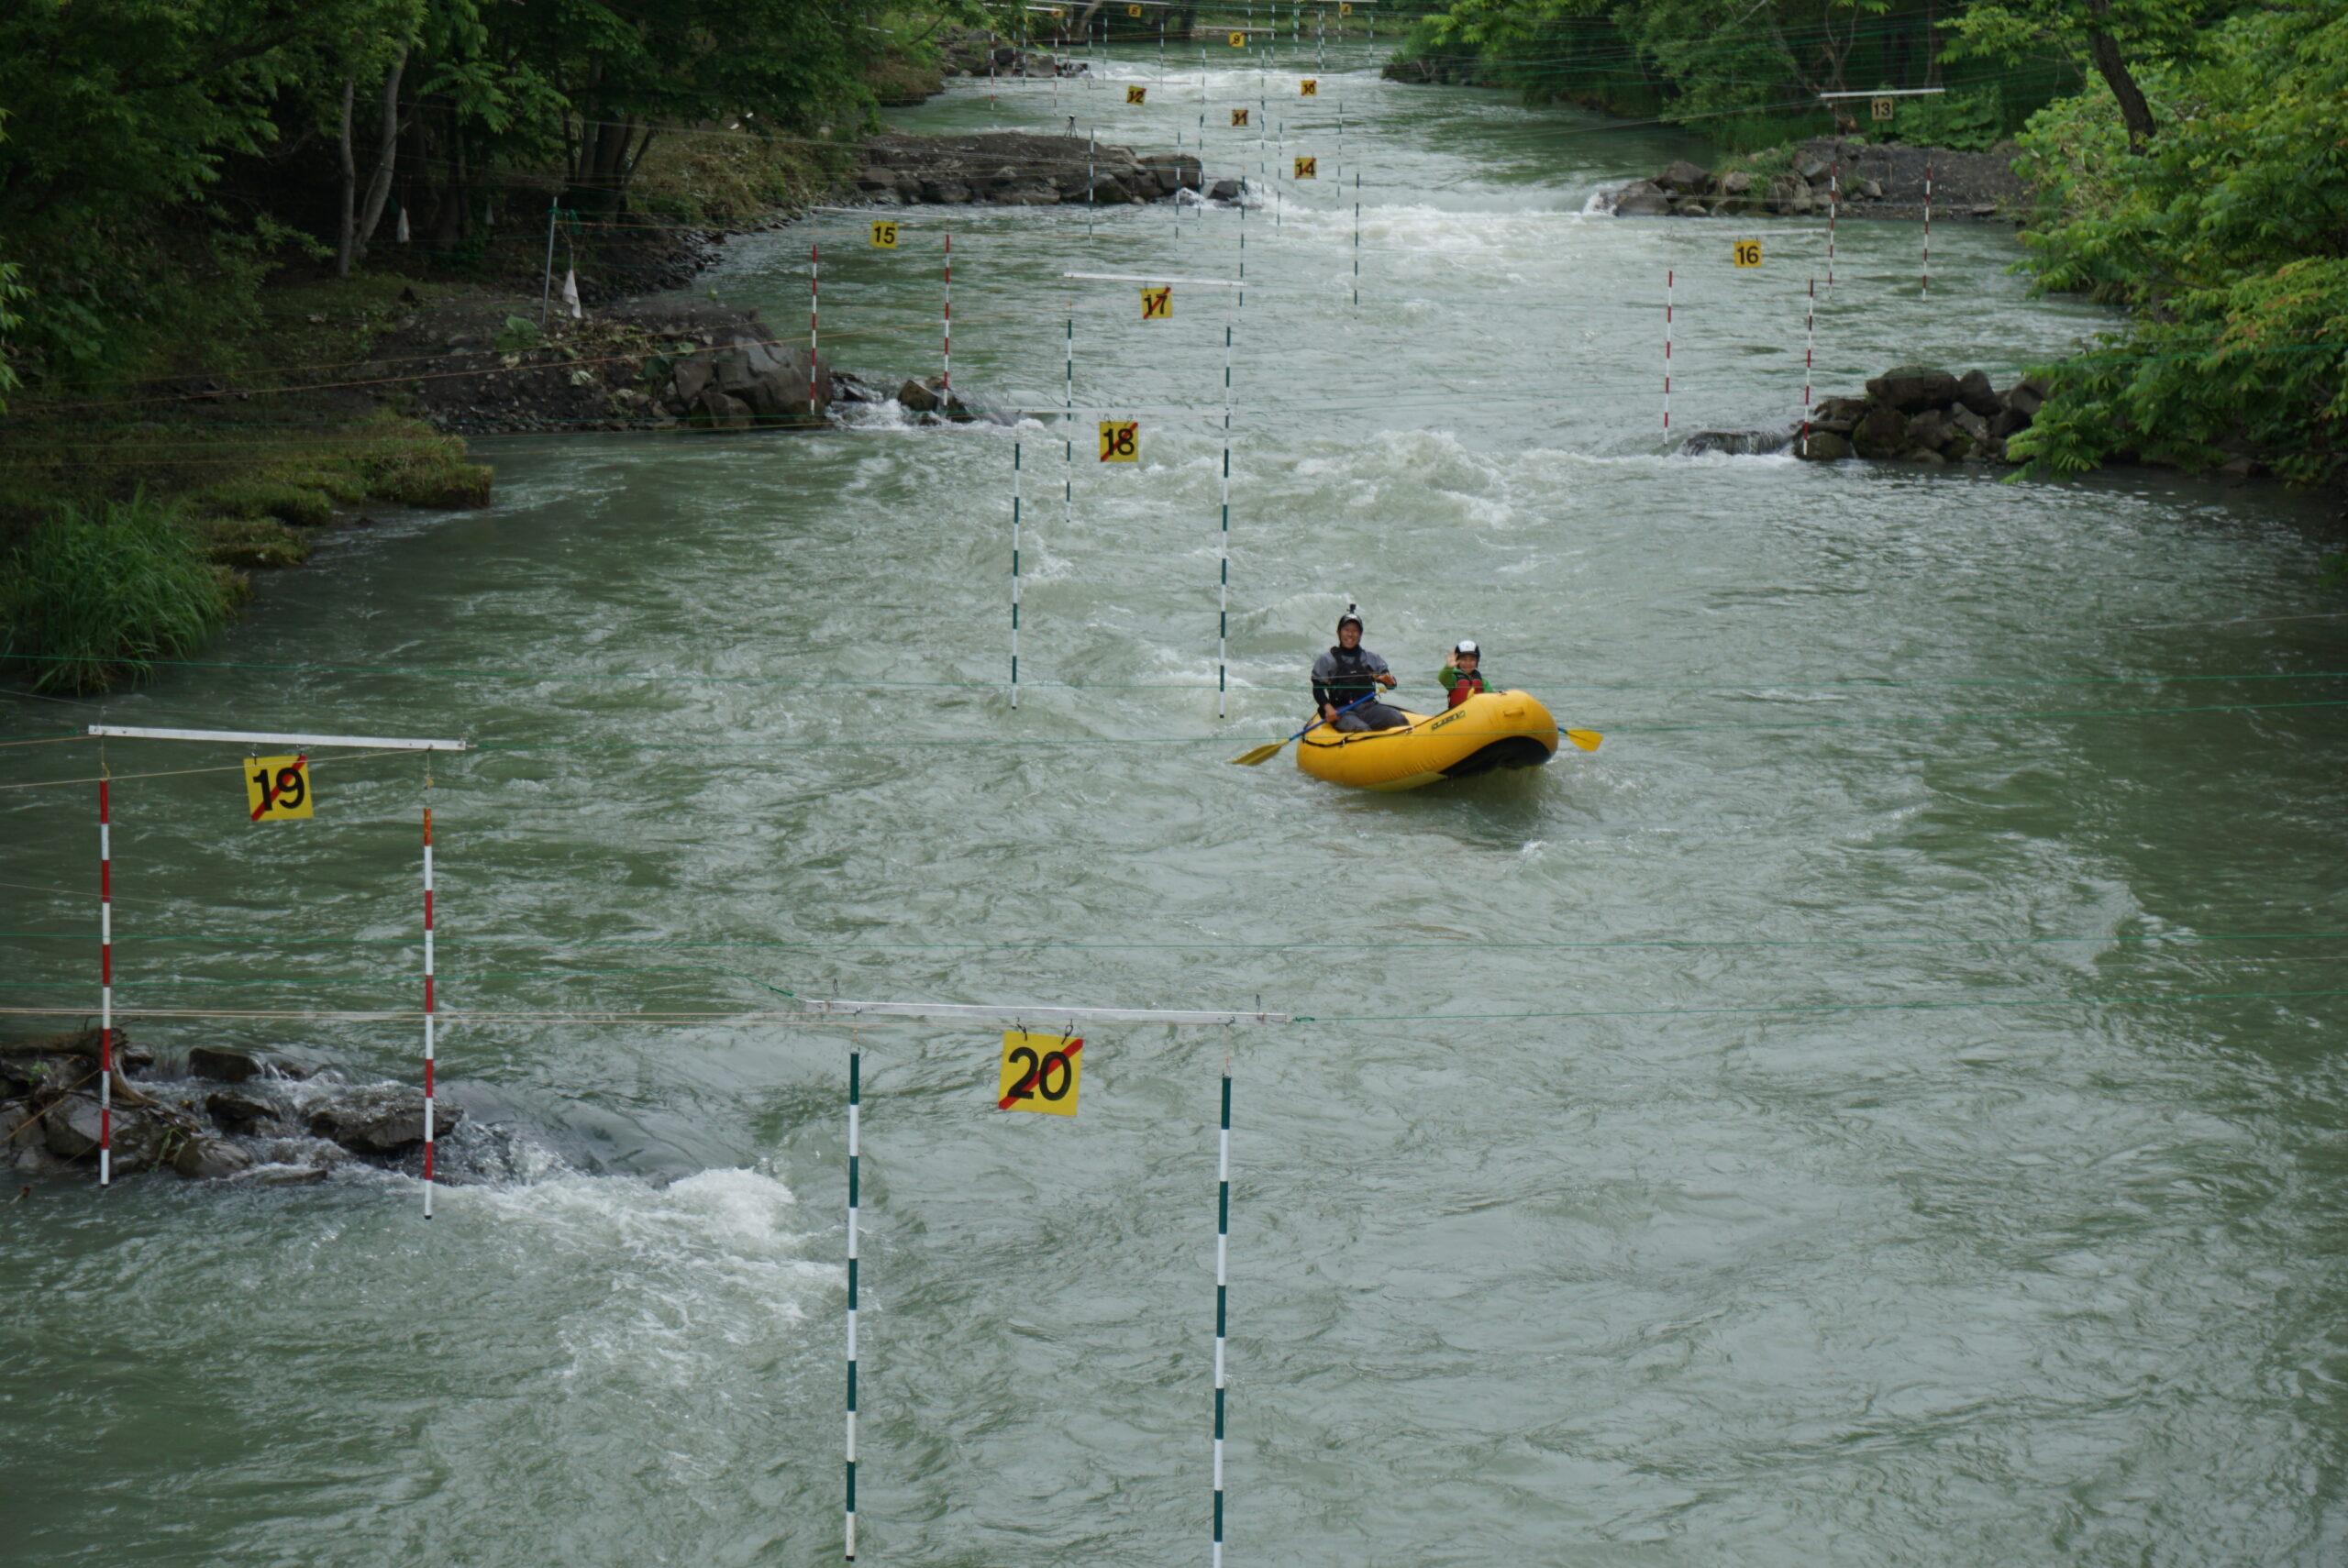 ikushunbetsu-river-slalom-course1